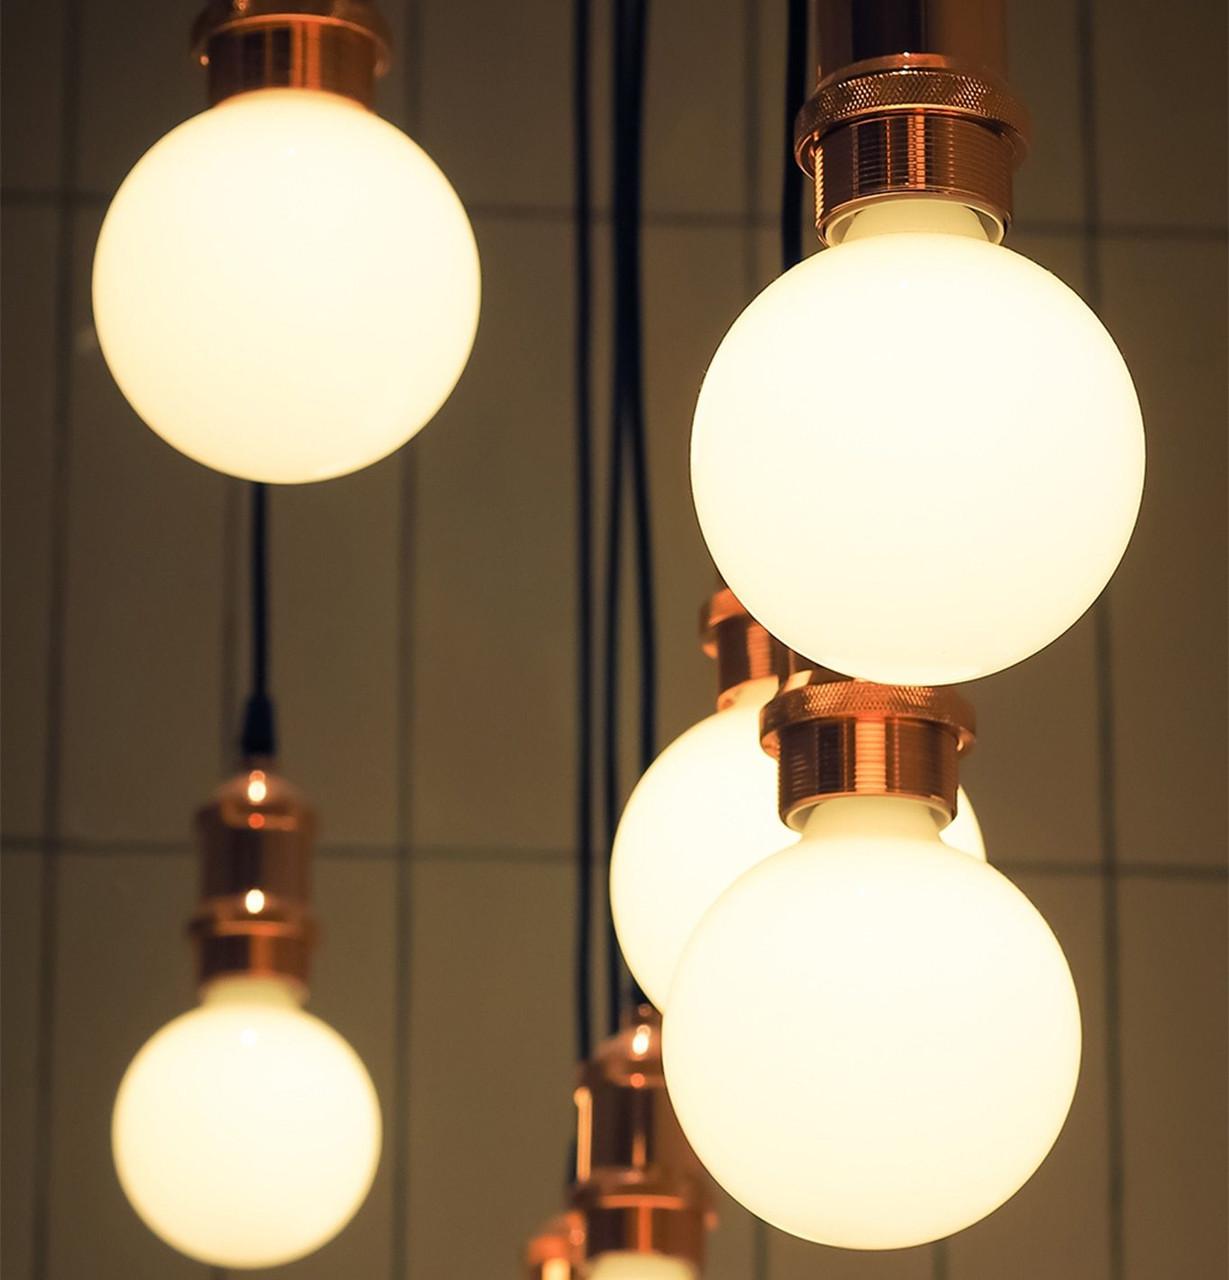 LED G80 E27 Light Bulbs